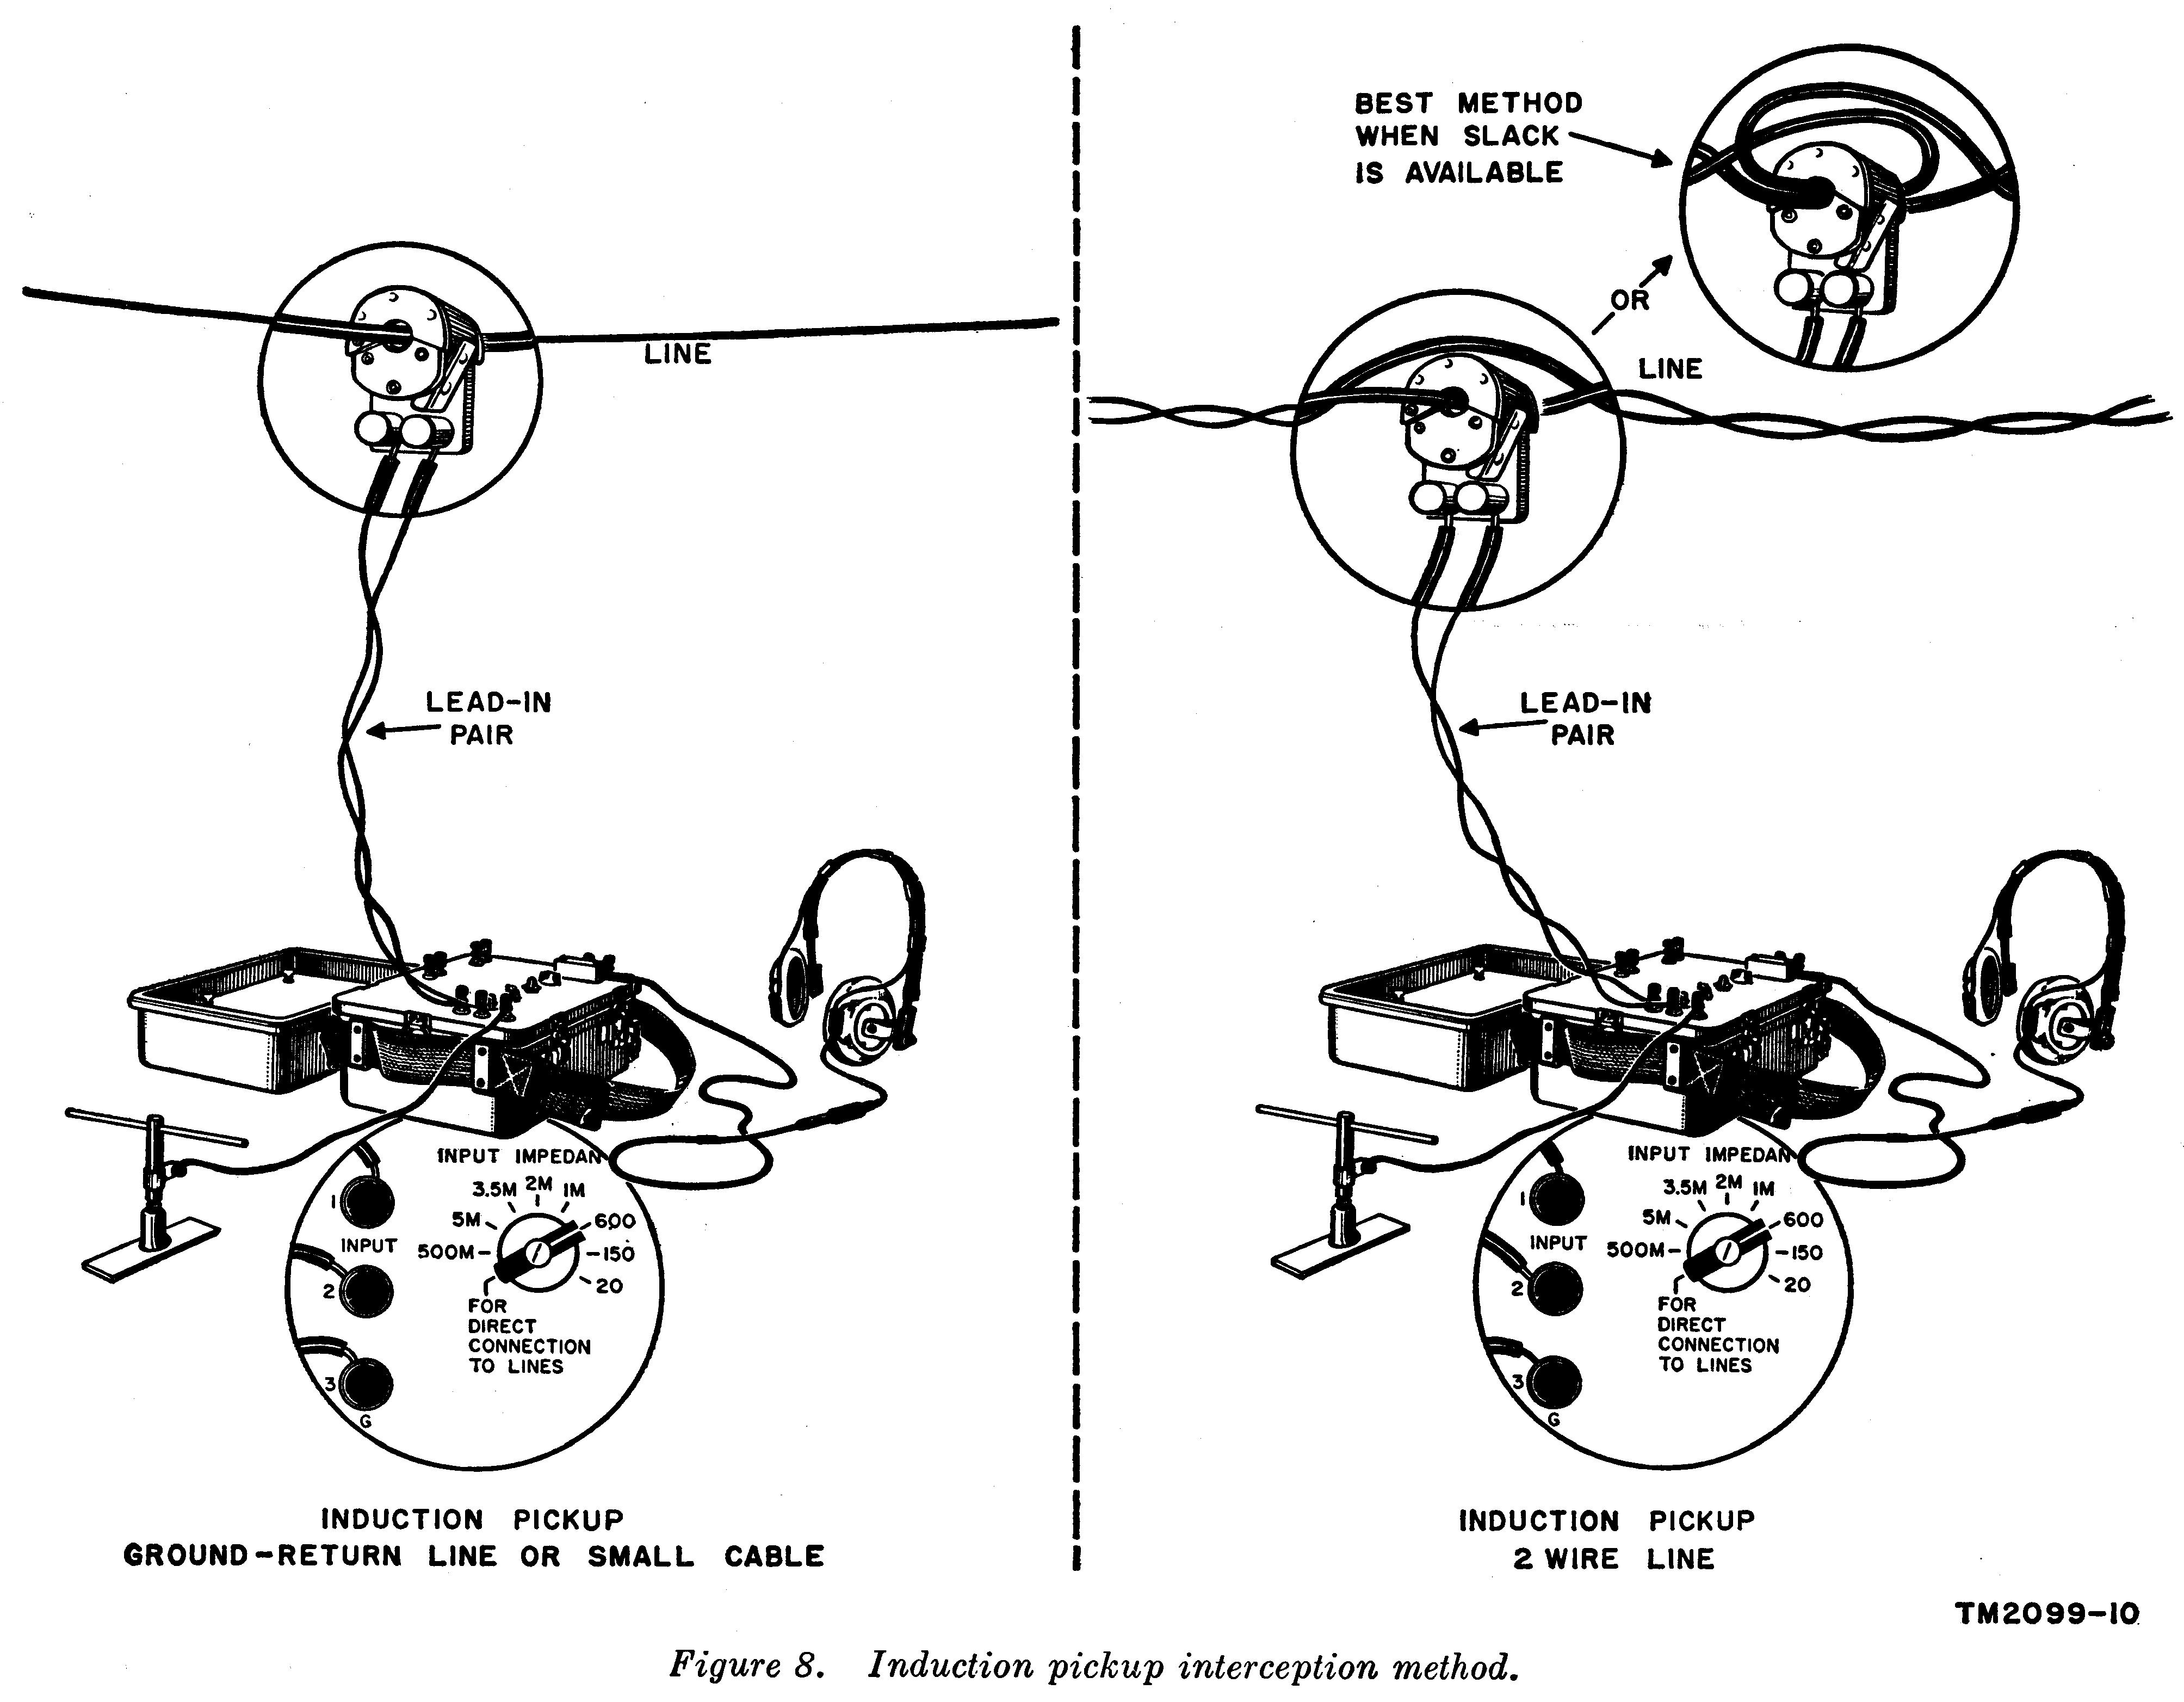 Induction pickup interception method.